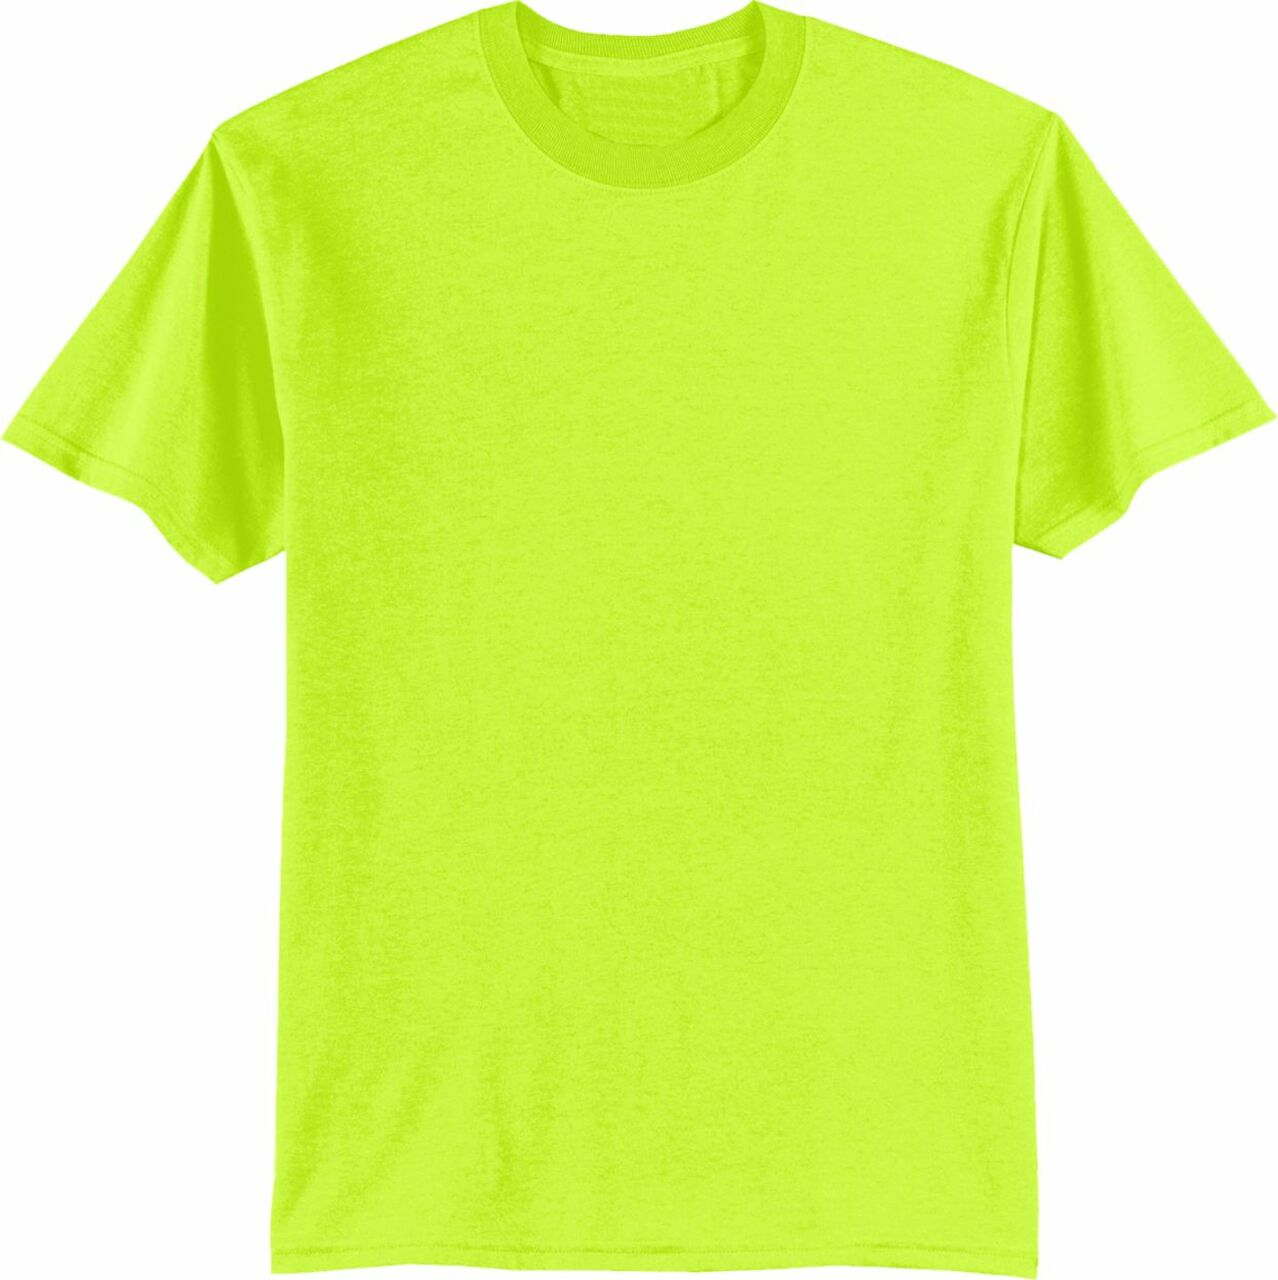 Safety Green TShirt | Hi Vis Work Shirt